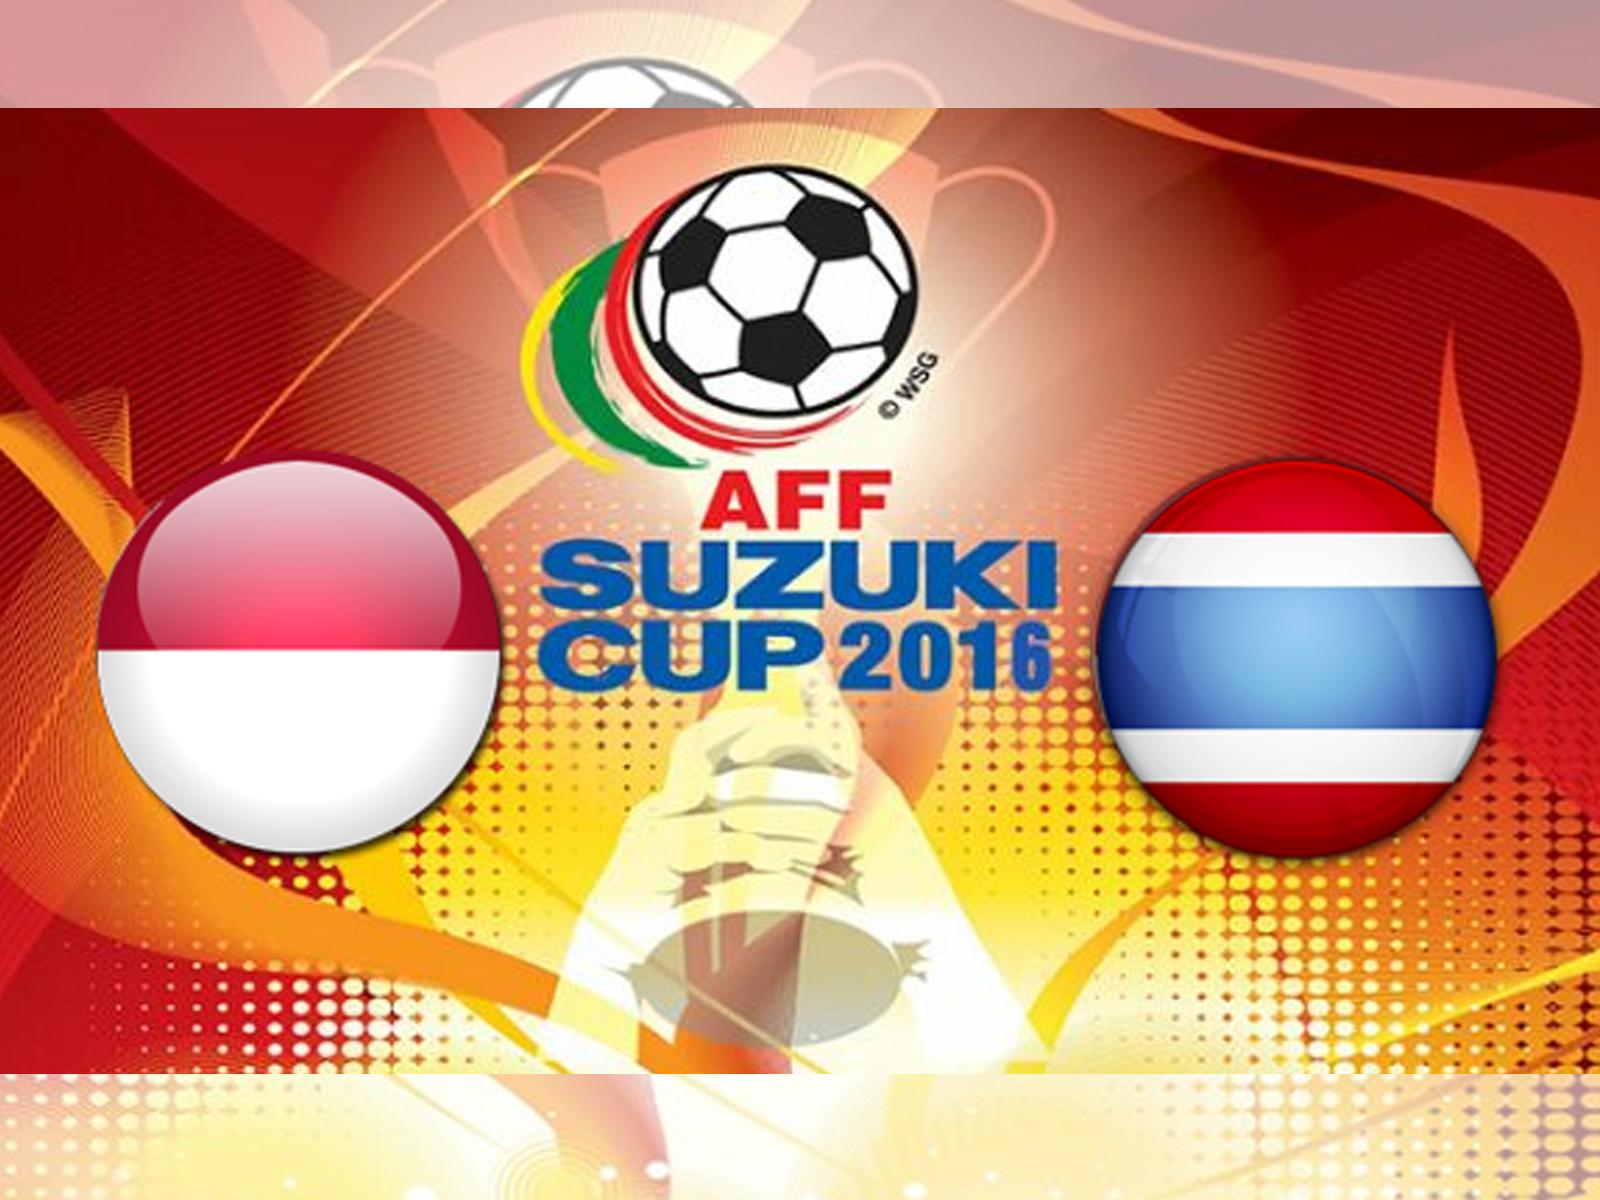 Predikisi Indonesia vs Thailand 14 Desember 2016